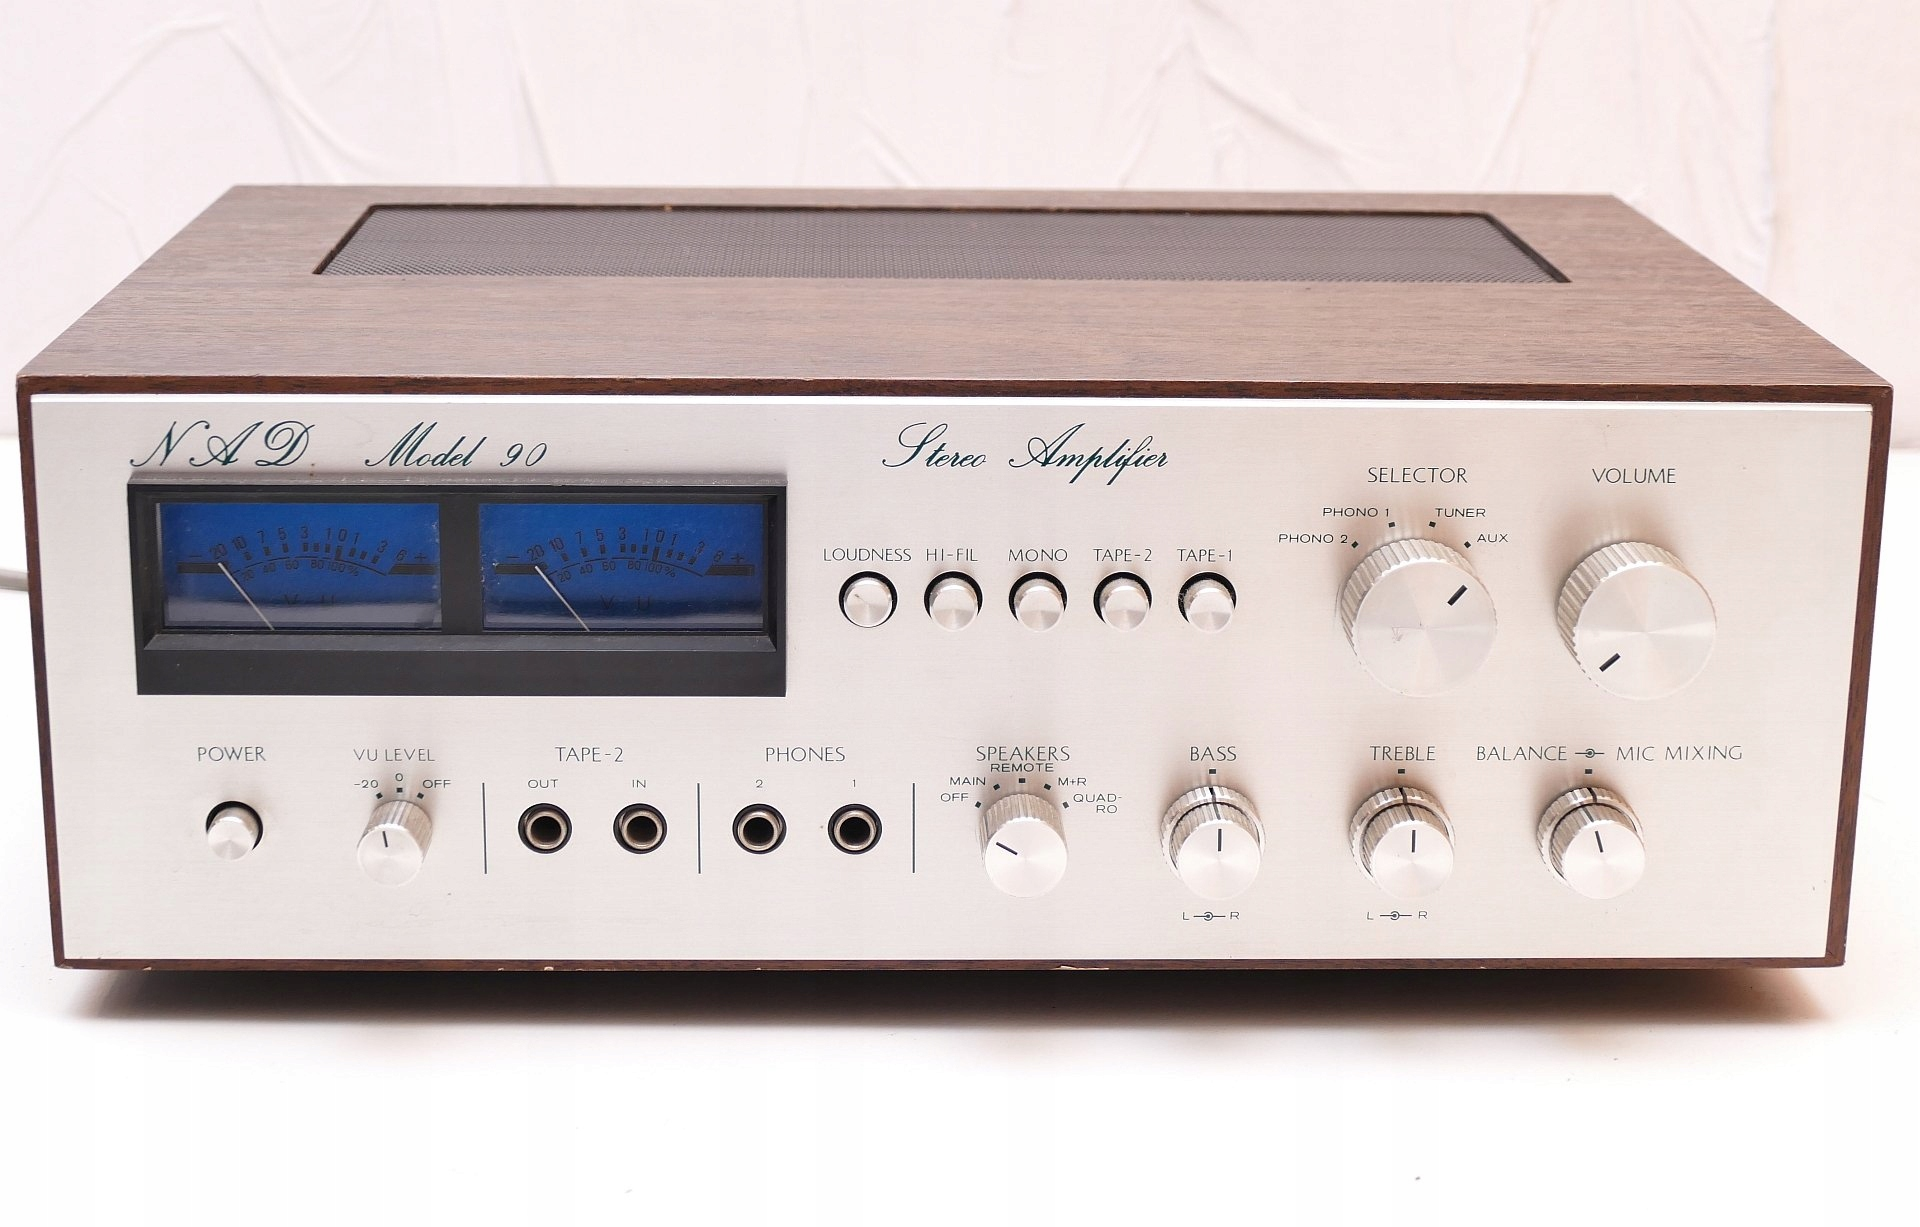 Wzmacniacz zintegrowany Nad model 90 rok 1976